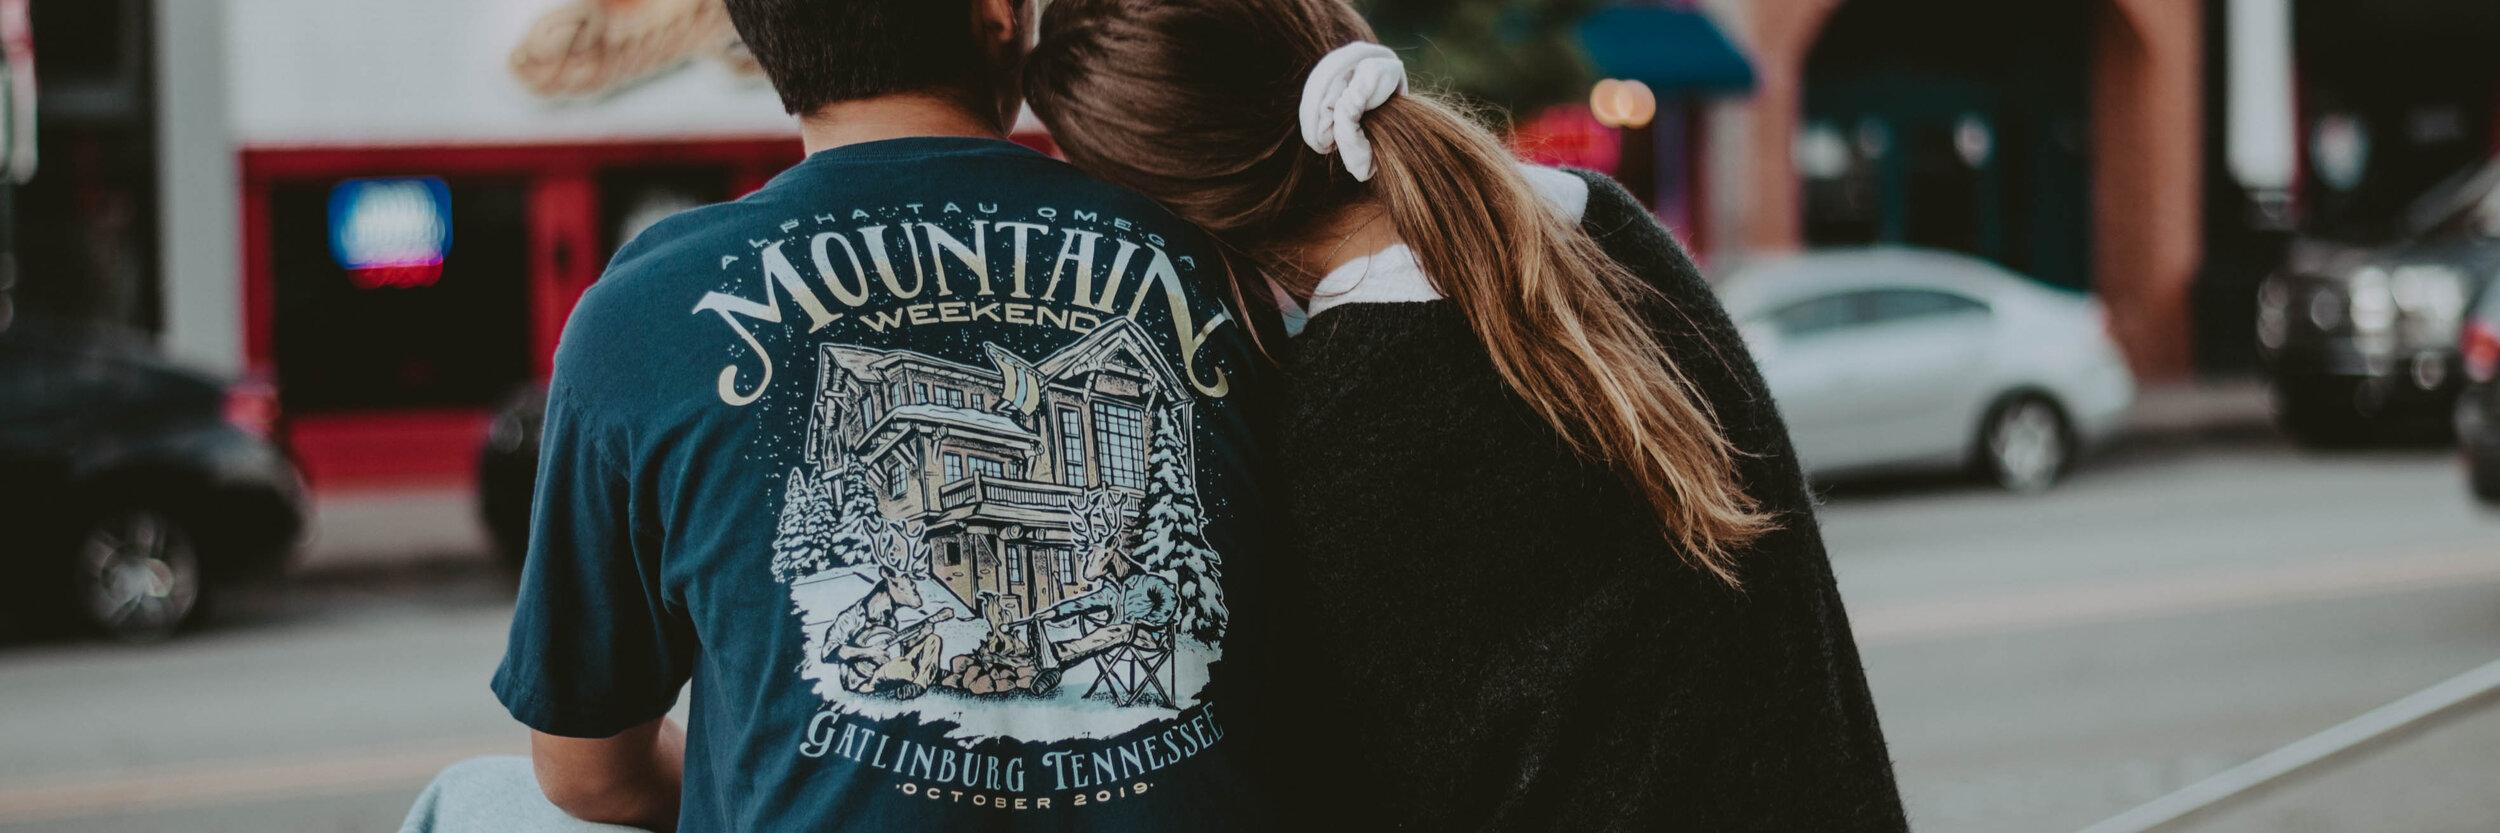 Mountain Weekend Tshirt Designs -